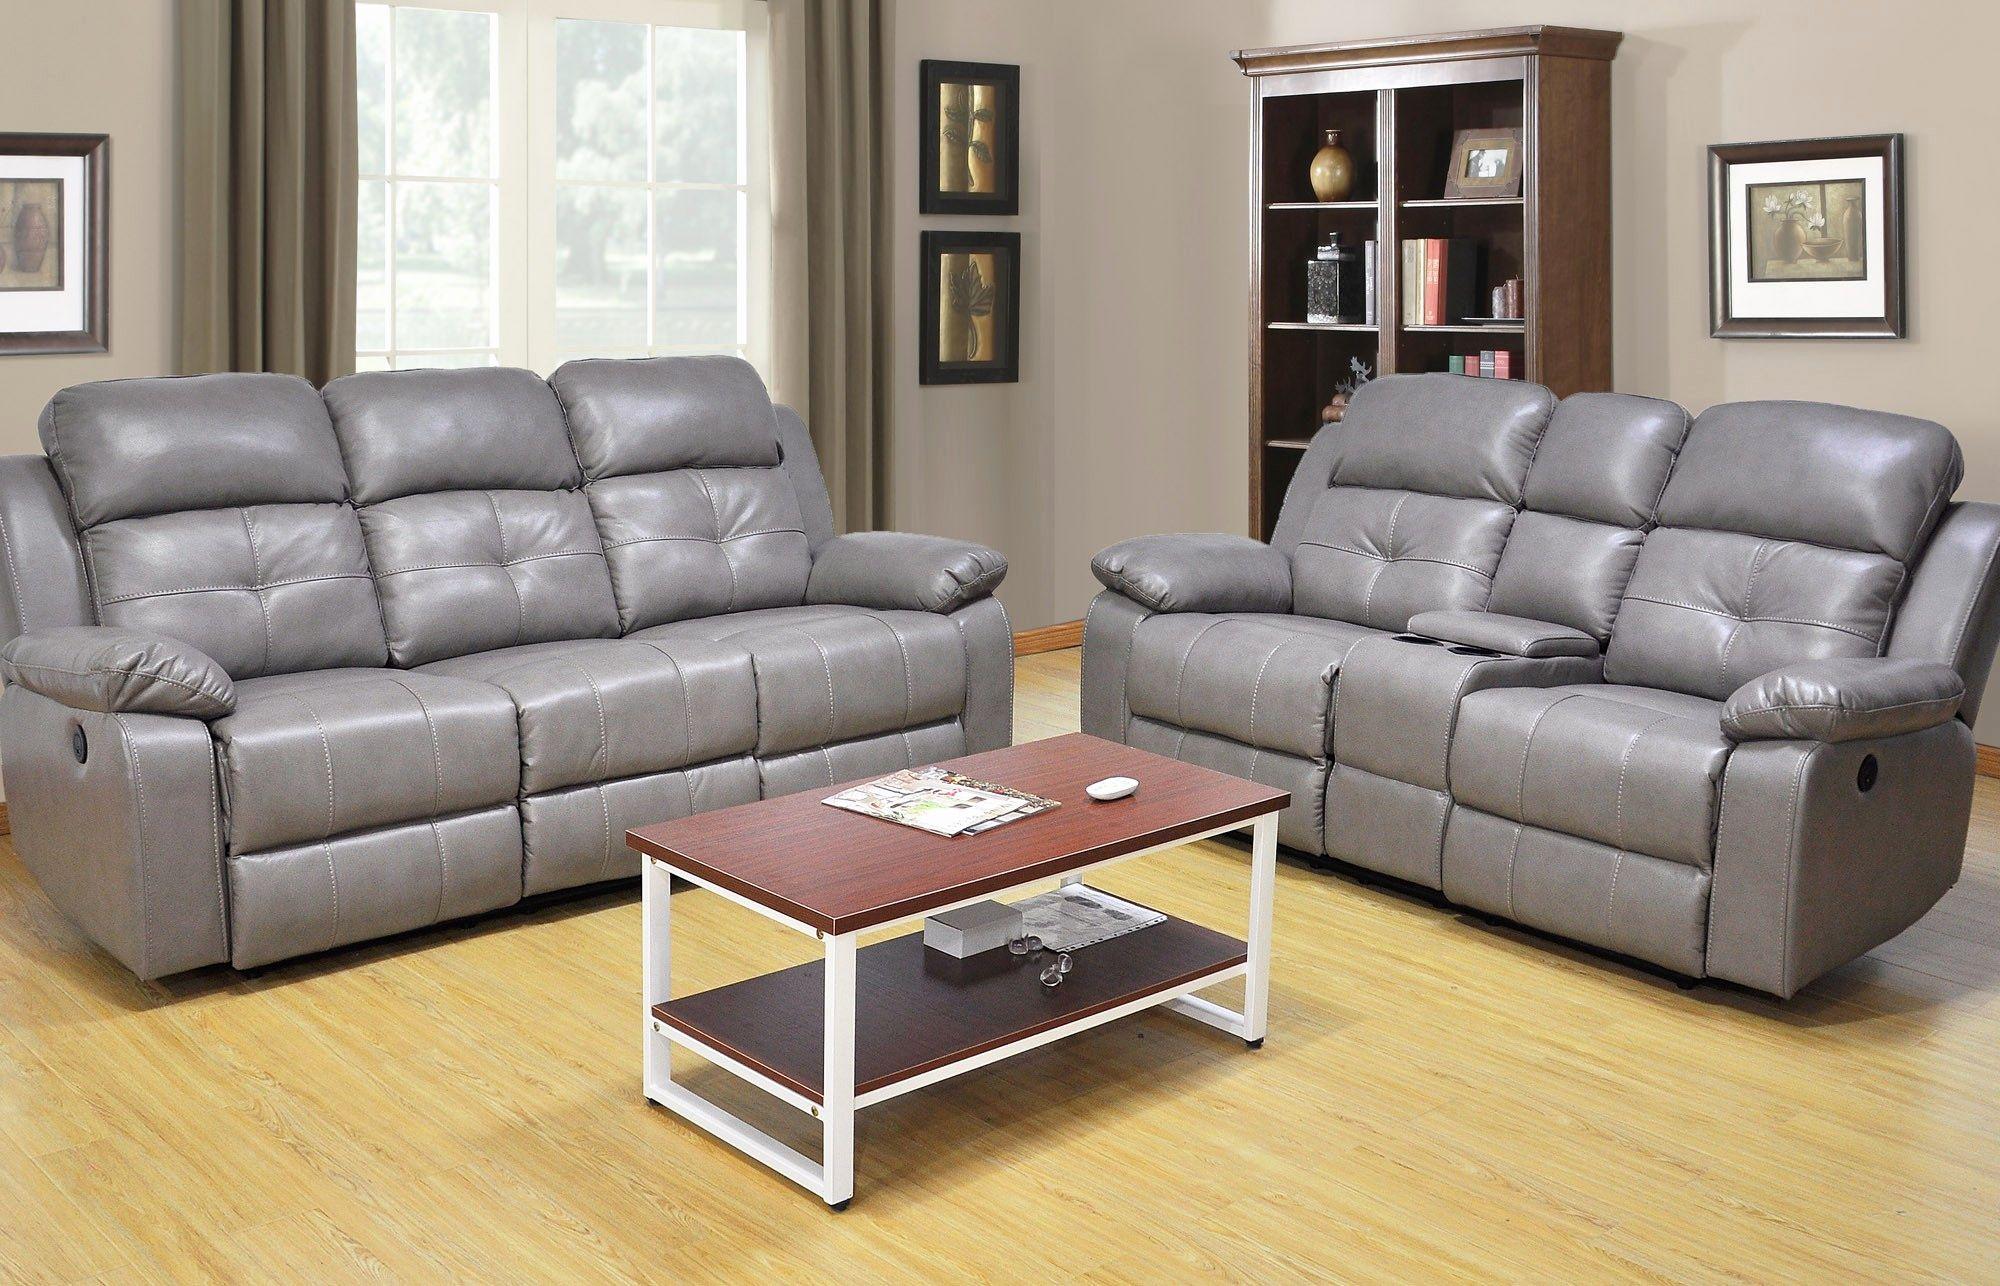 Idea Power Reclining Sofa And Loveseat Sets Pics Power Reclining Sofa And Loveseat Sets Lovely 2 Piece Gray Sofa And Loveseat Set Loveseat Living Room Sofa Set #power #living #room #sets